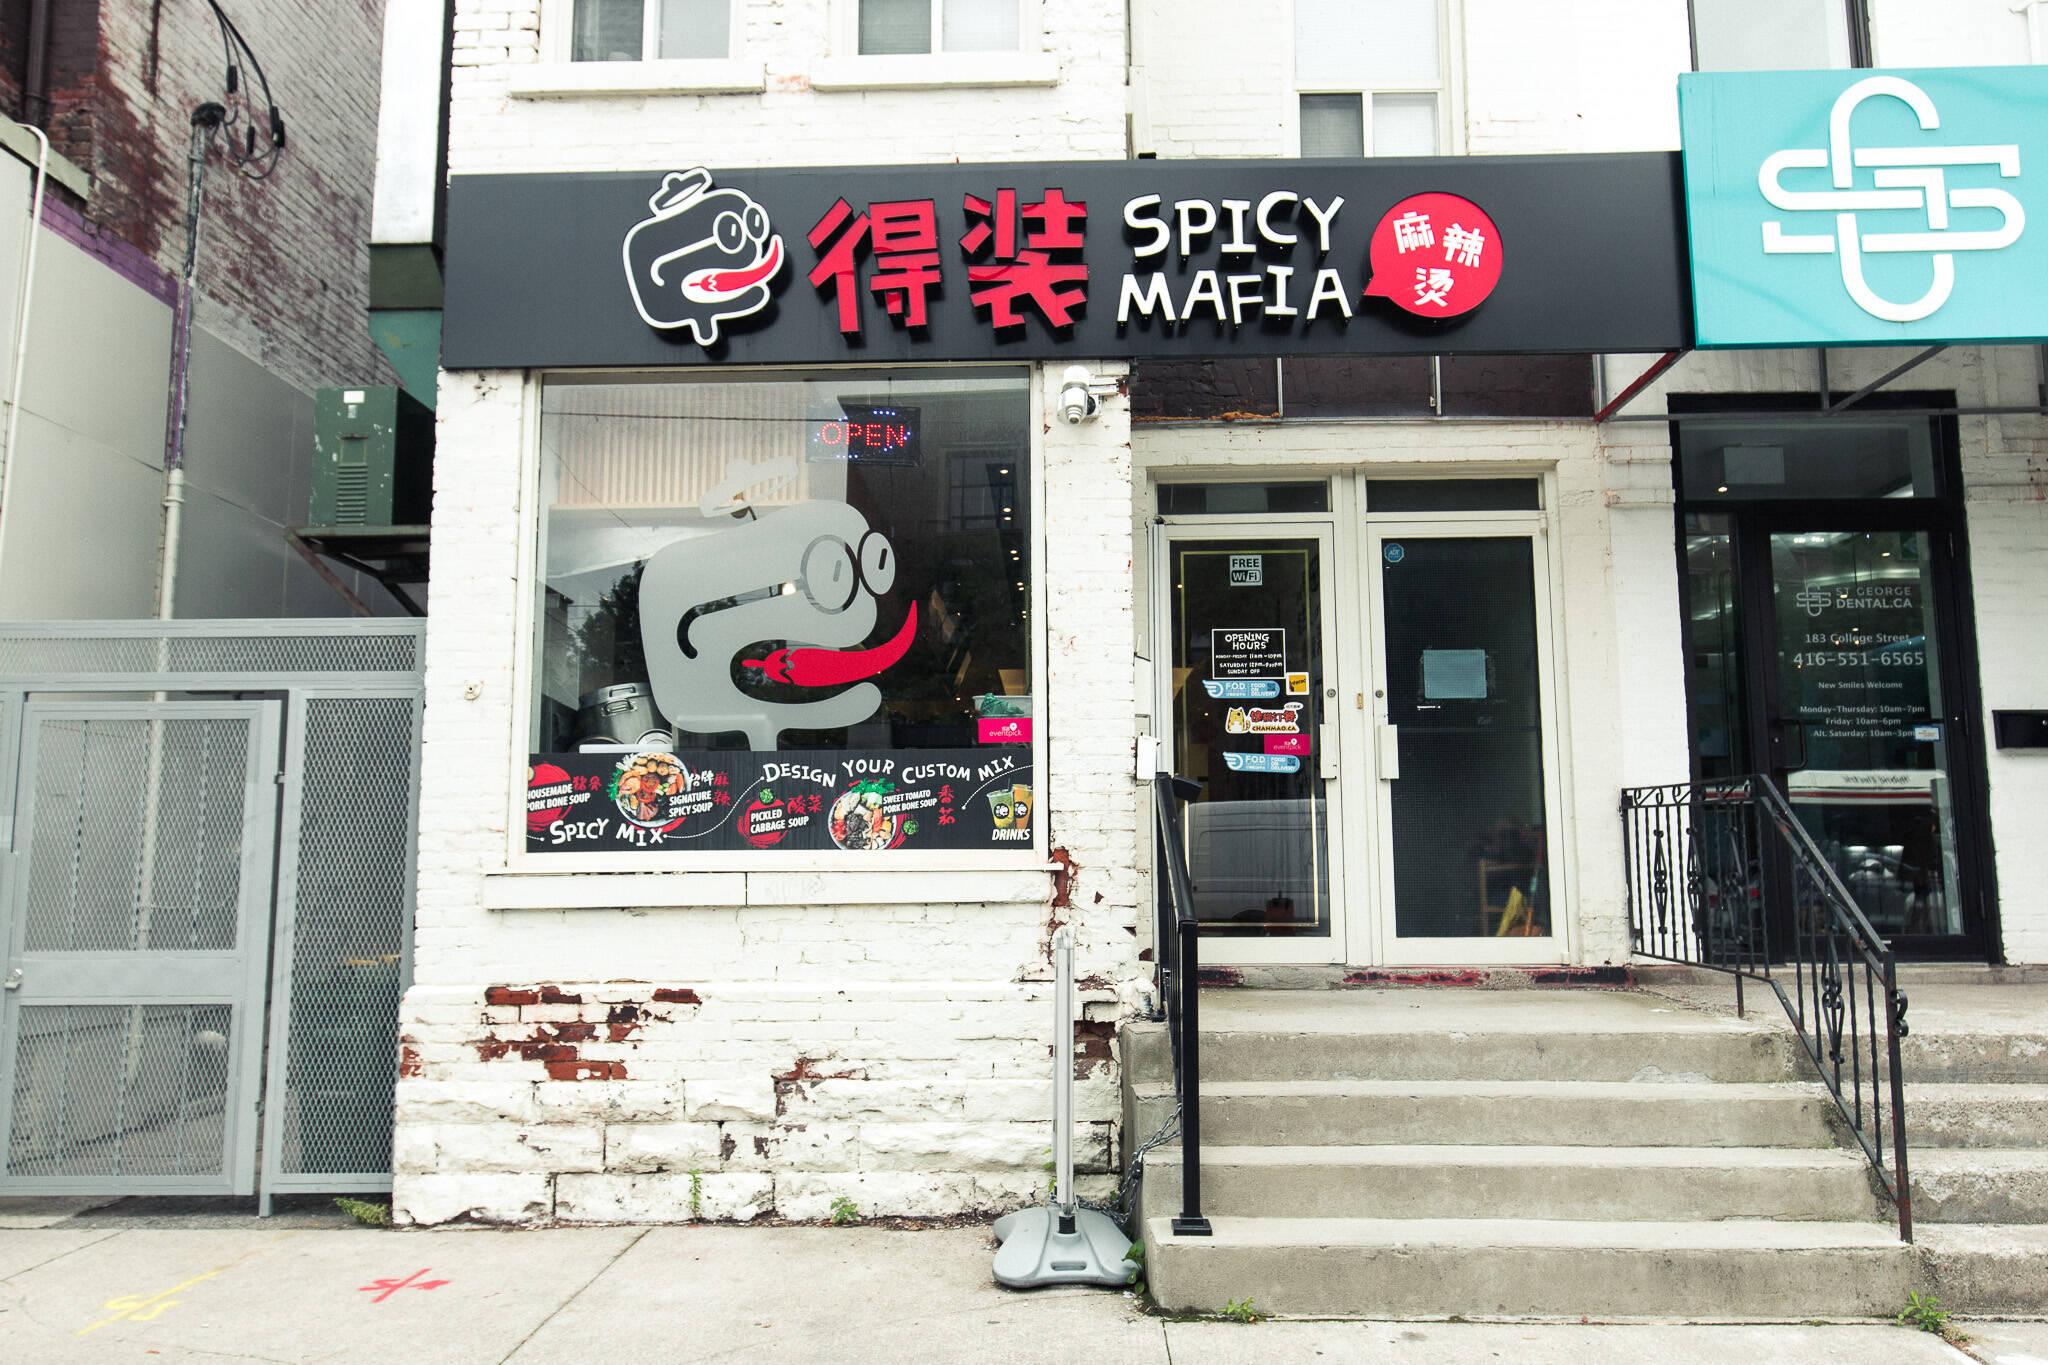 Spicy Mafia Toronto